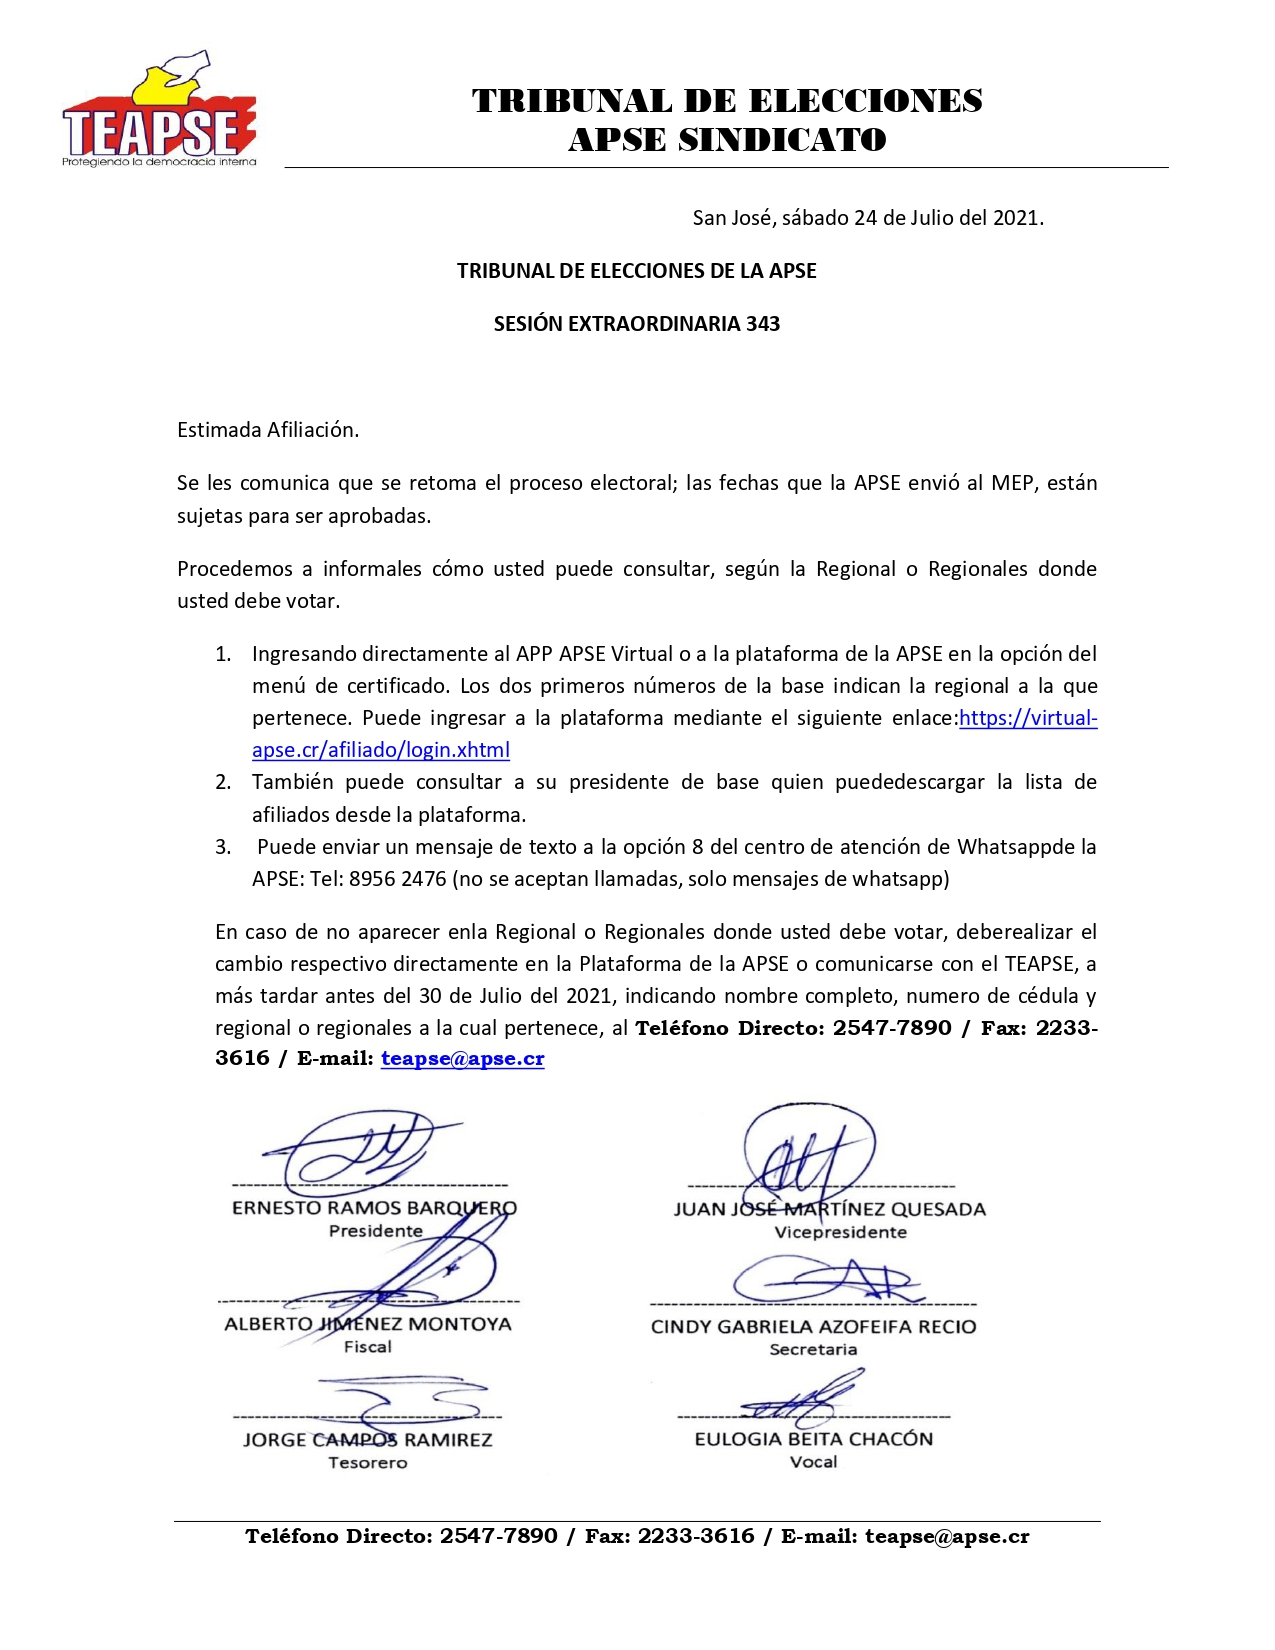 TEAPSE RETOMA PROCESO ELECTORAL 2021